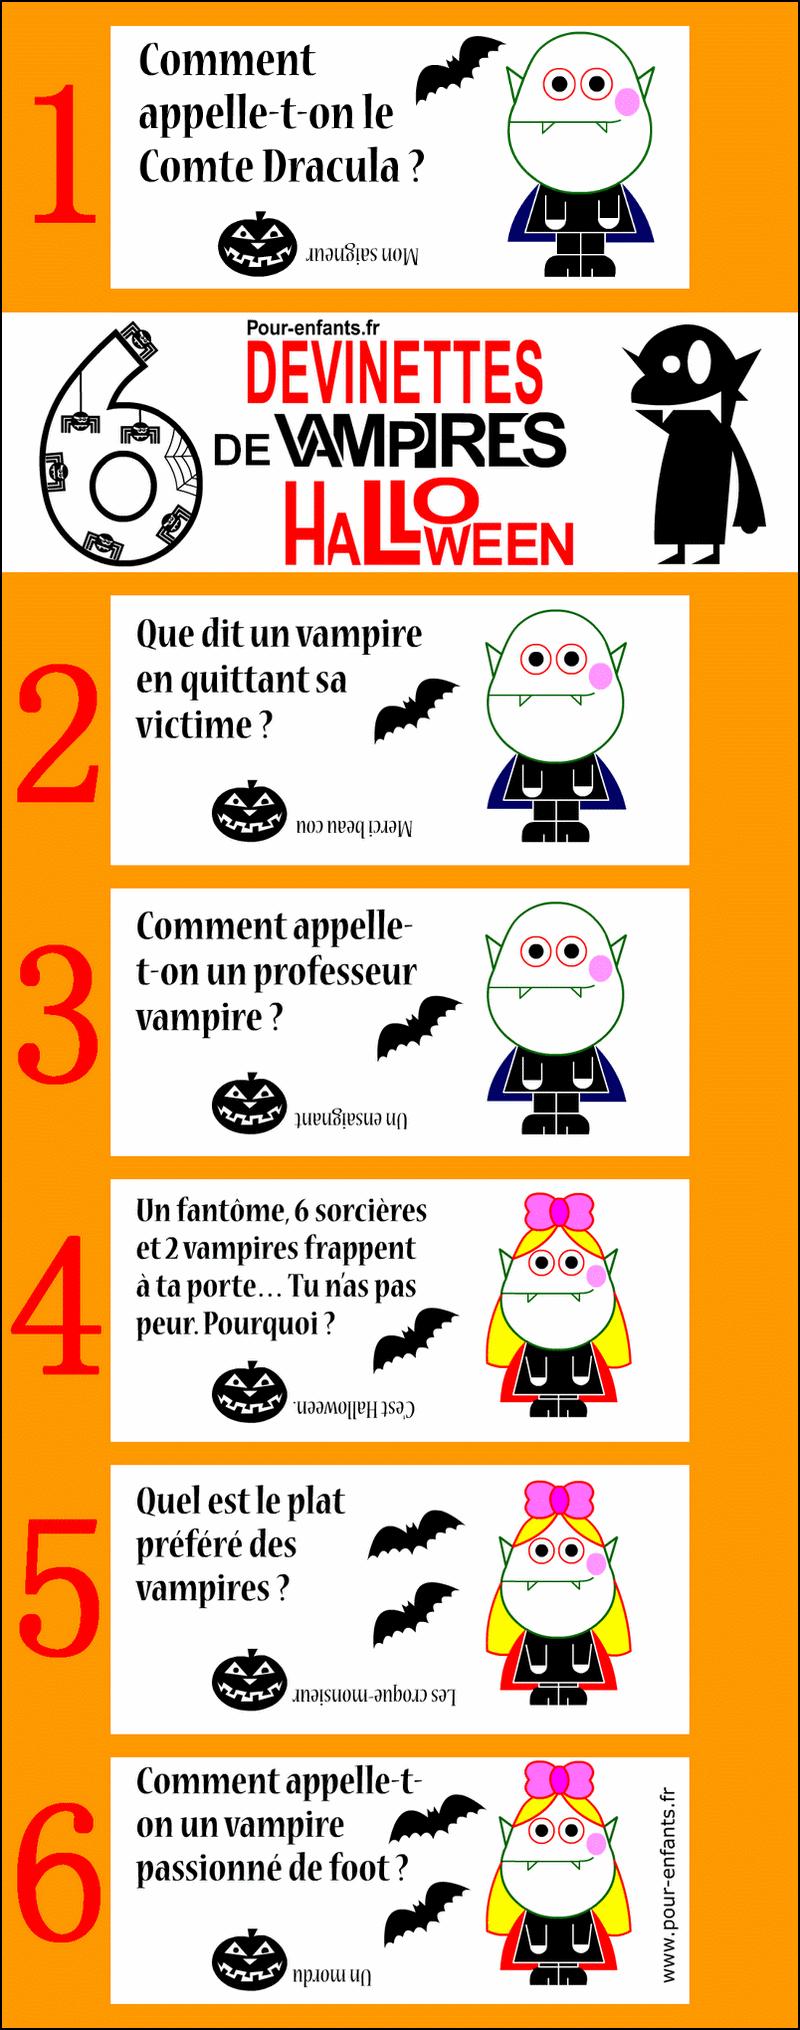 Blagues D'halloween Archives - Charades, Jeux, Blagues encequiconcerne Halloween Ce2